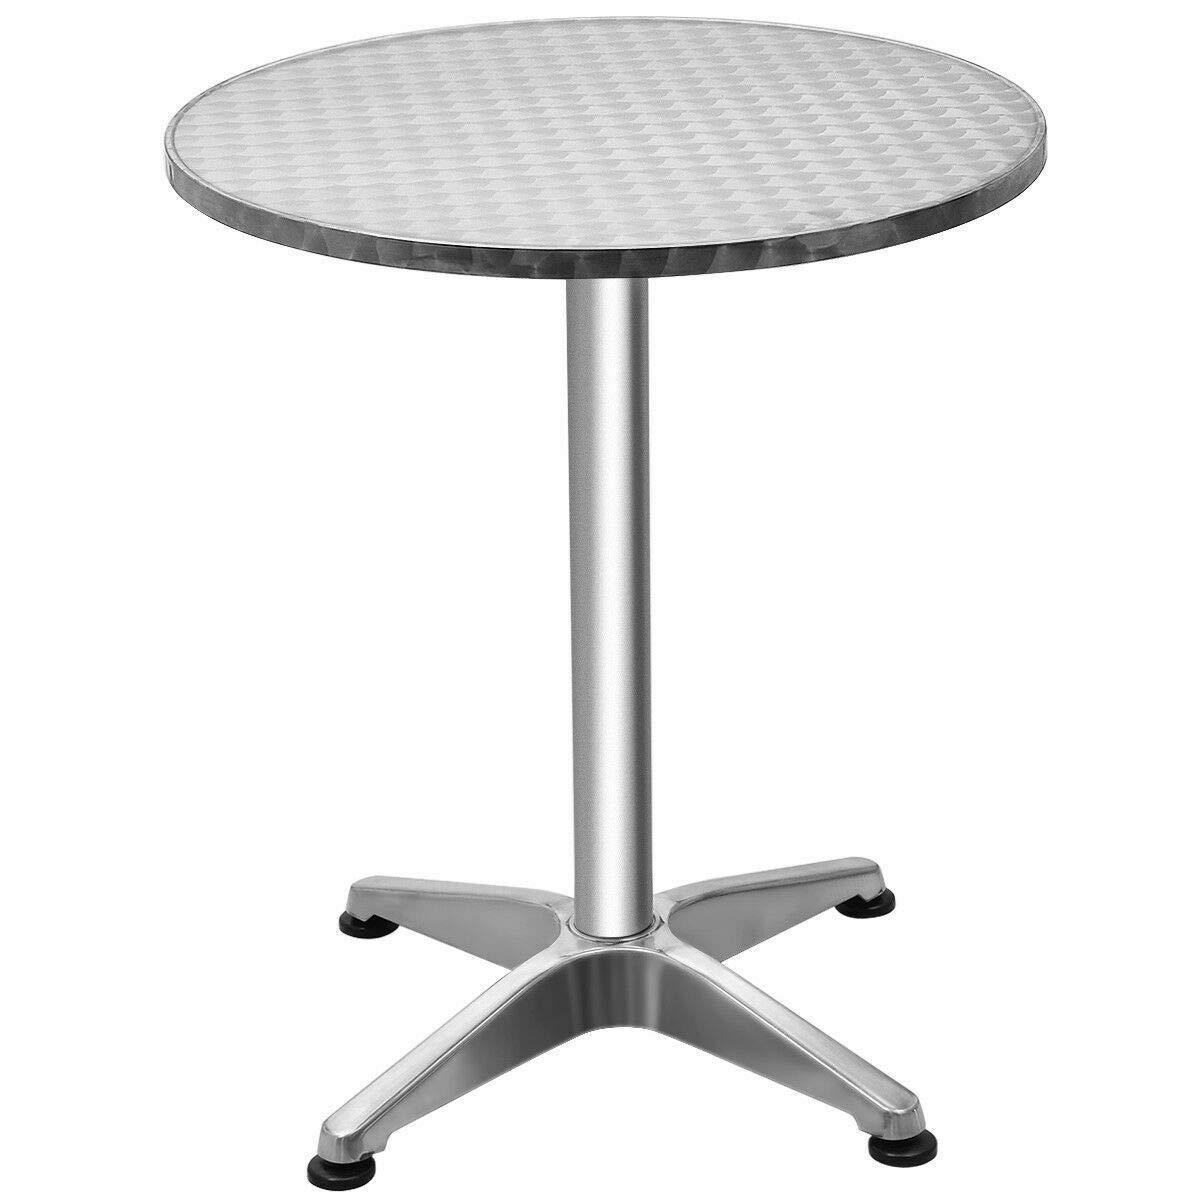 (NEW Patio & Garden Furniture) Aluminium 23 1/2'' Round Top Bar Table Indoor Outdoor Bistro Pub w/Base New by (NEW Patio & Garden Furniture)